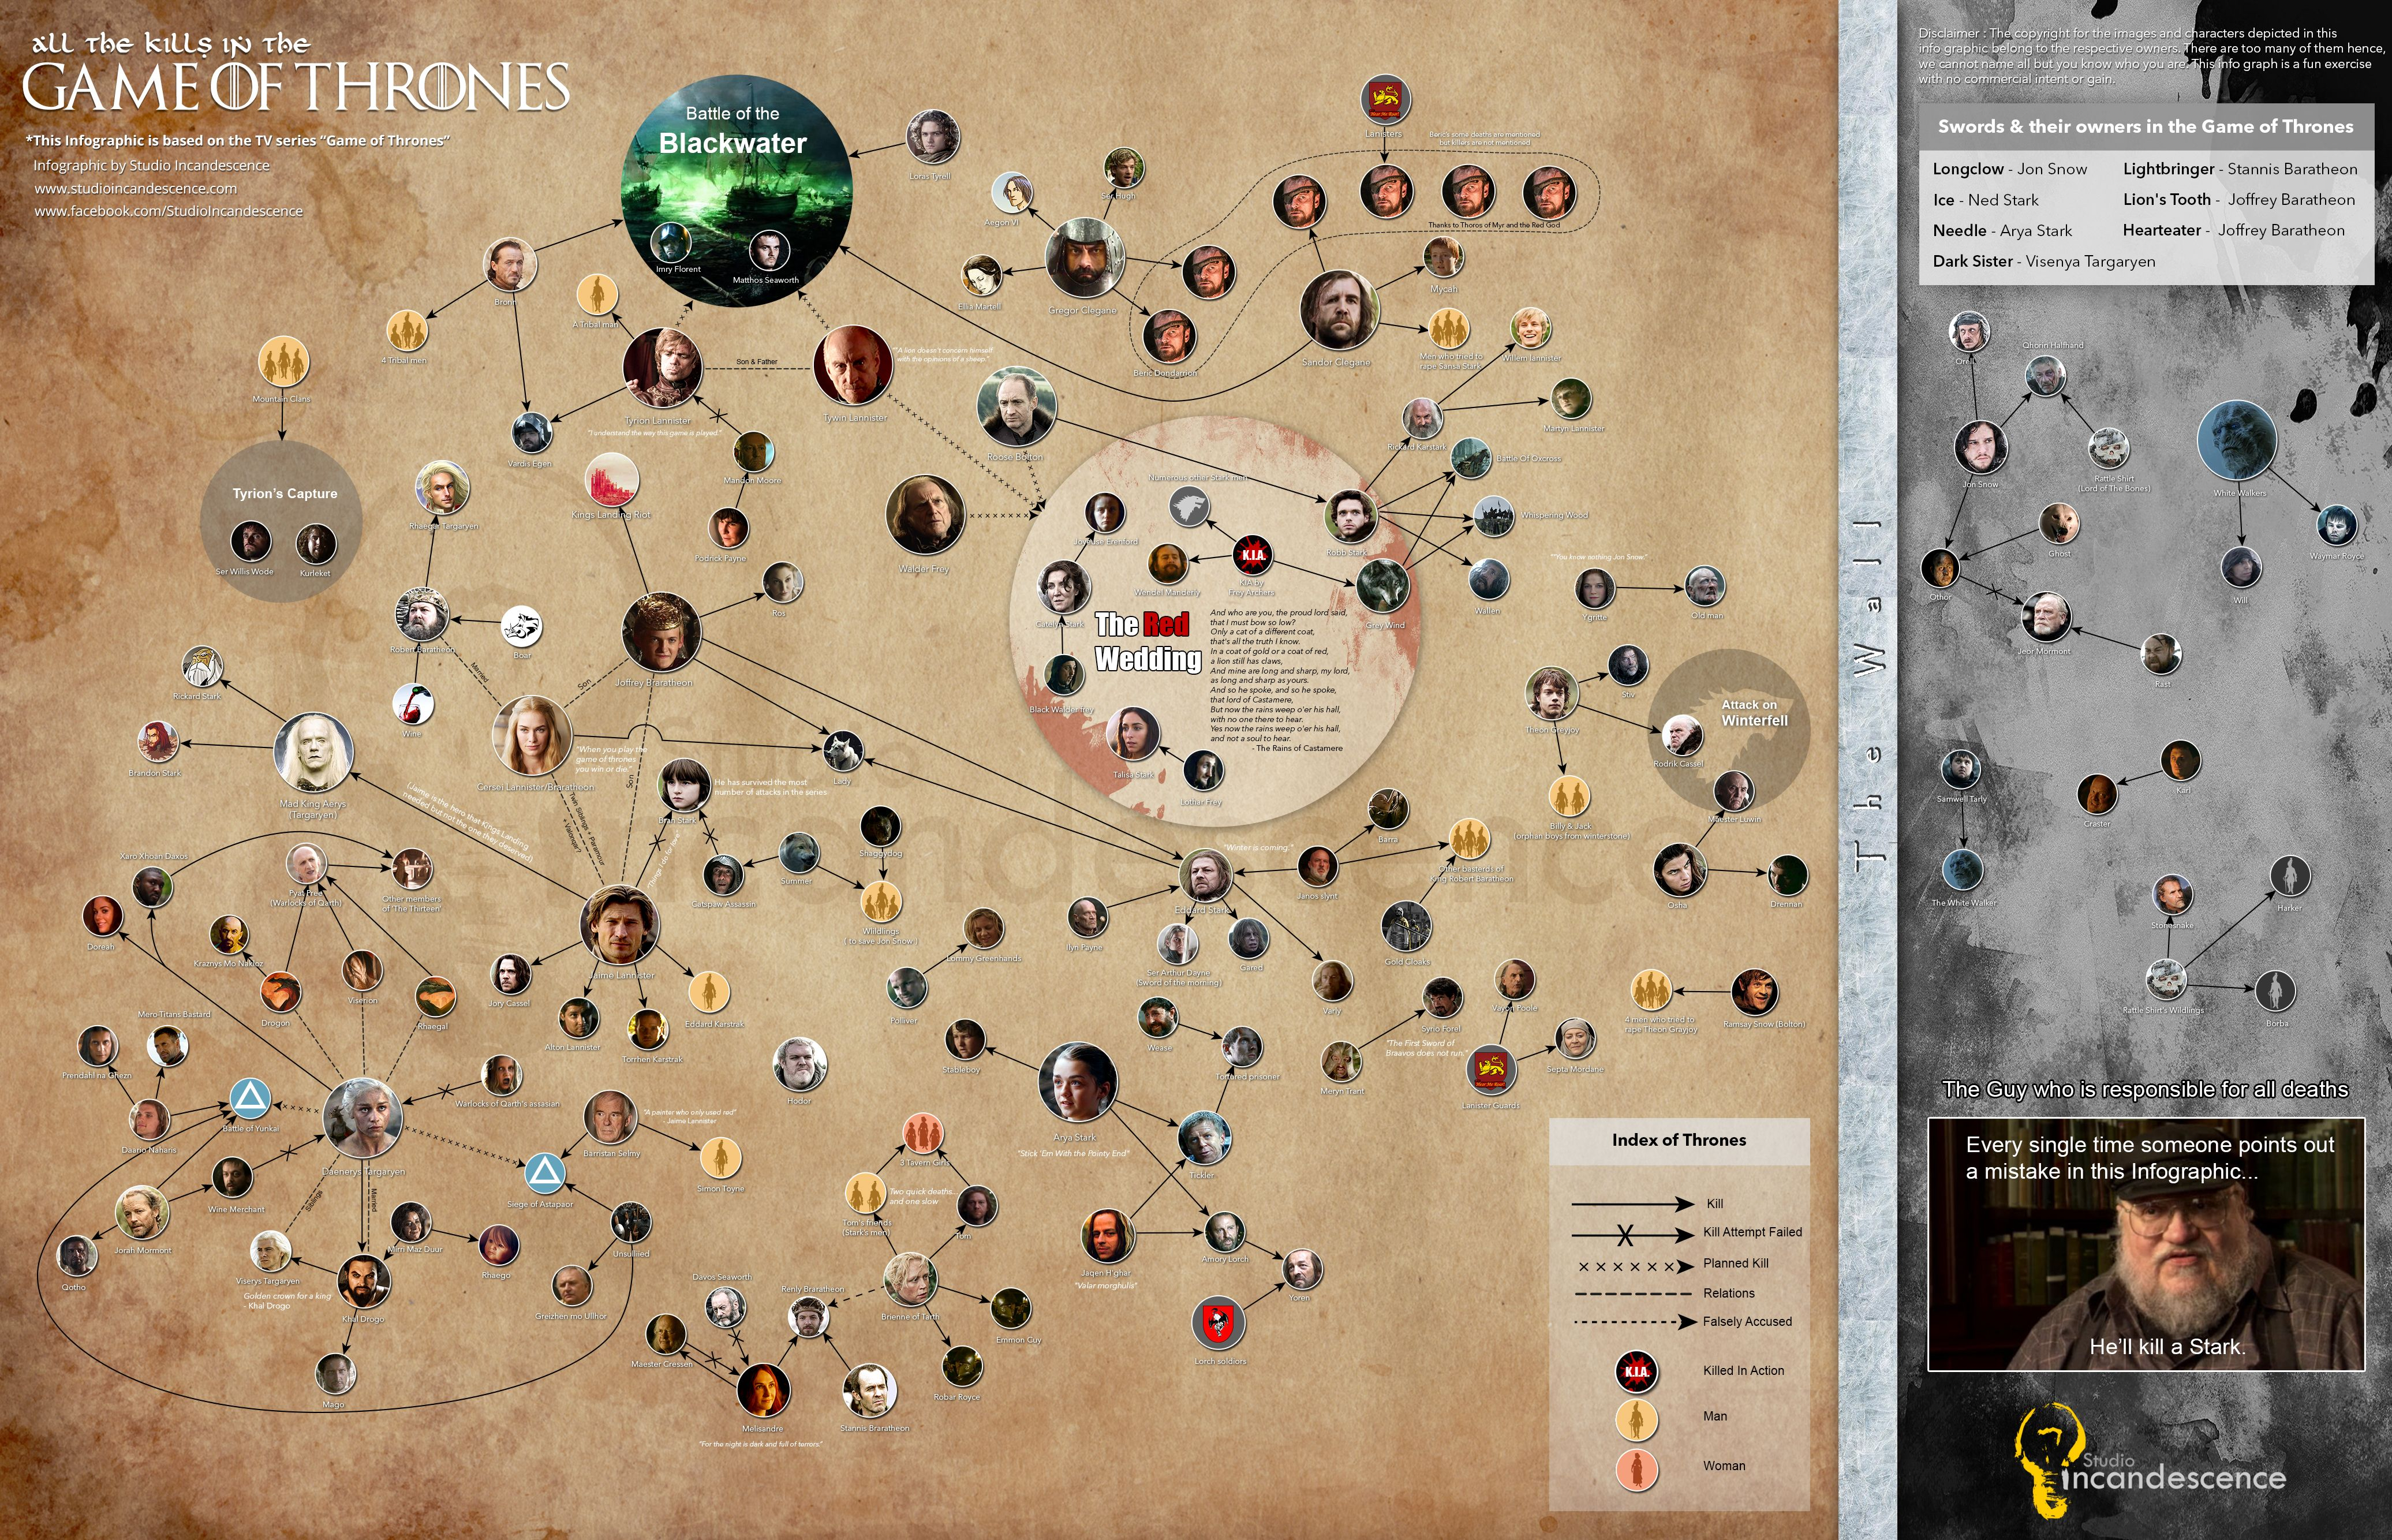 Game of thrones infographic(series) 06(update) by studioincandescence.deviantart.com on @deviantART